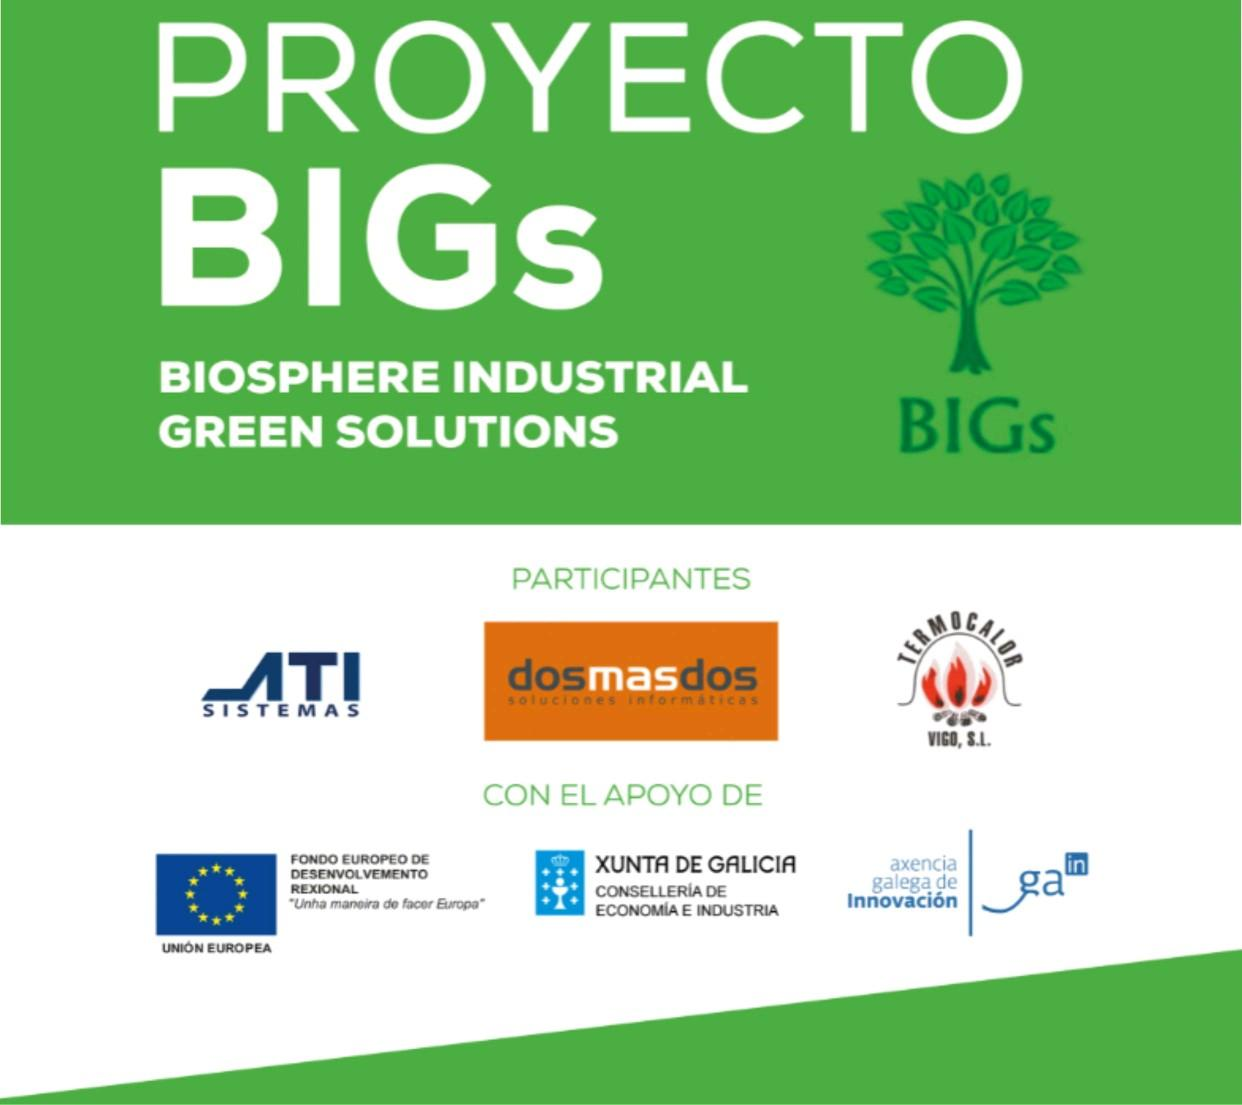 Proyecto BIGs